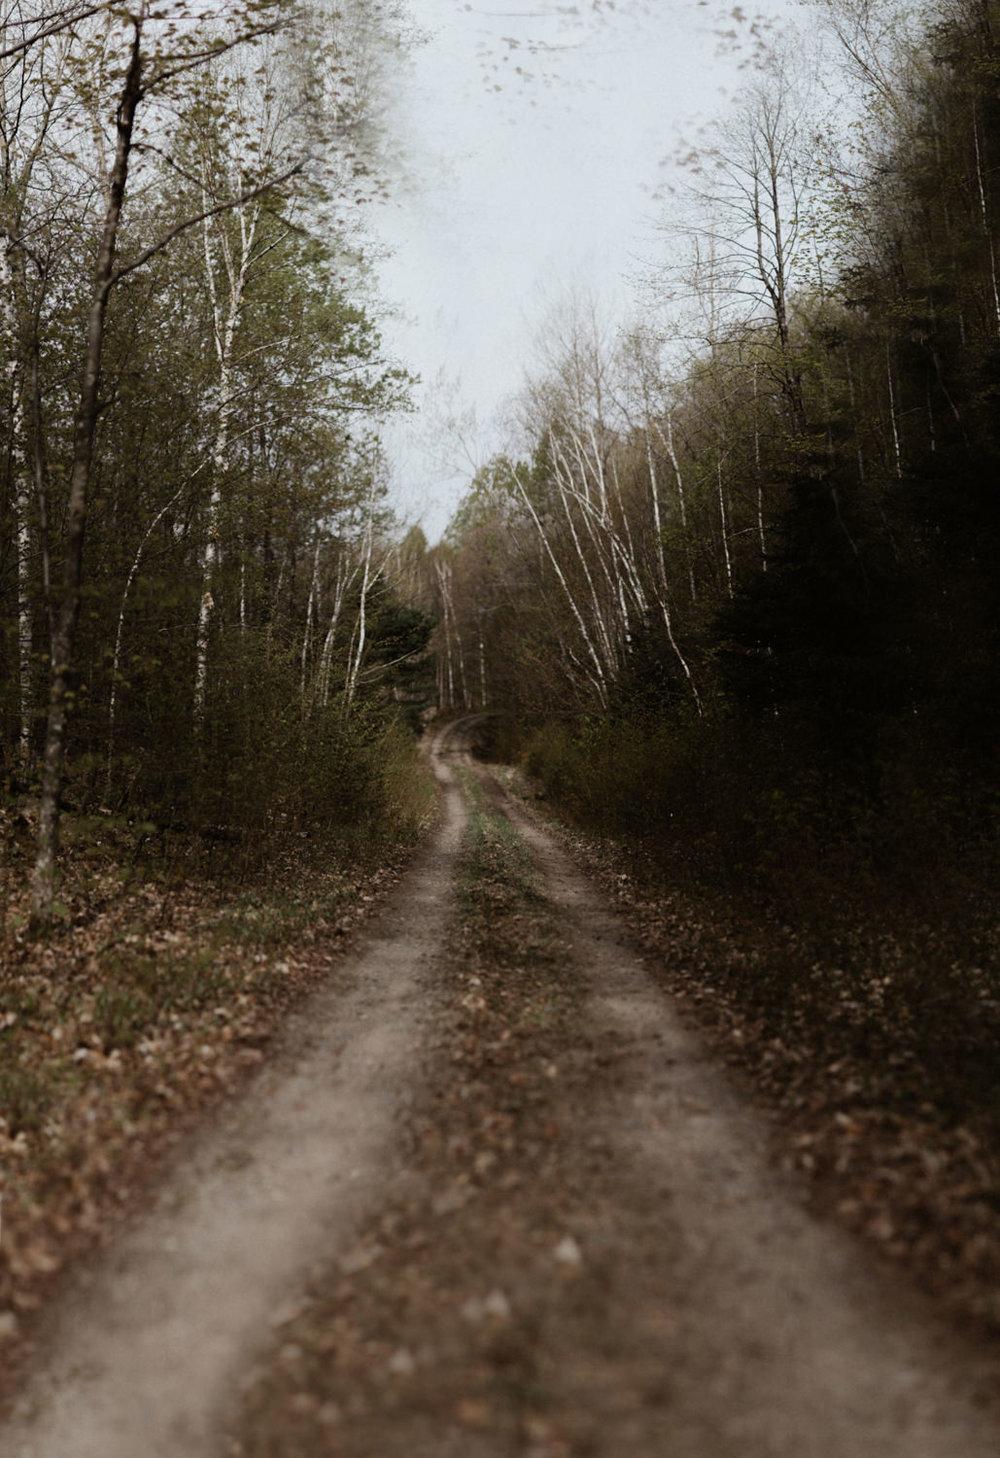 Pêche 2018 Full hd yanick lespérance outaouais peche aventure chasse lac forêt  (24 of 104).jpg